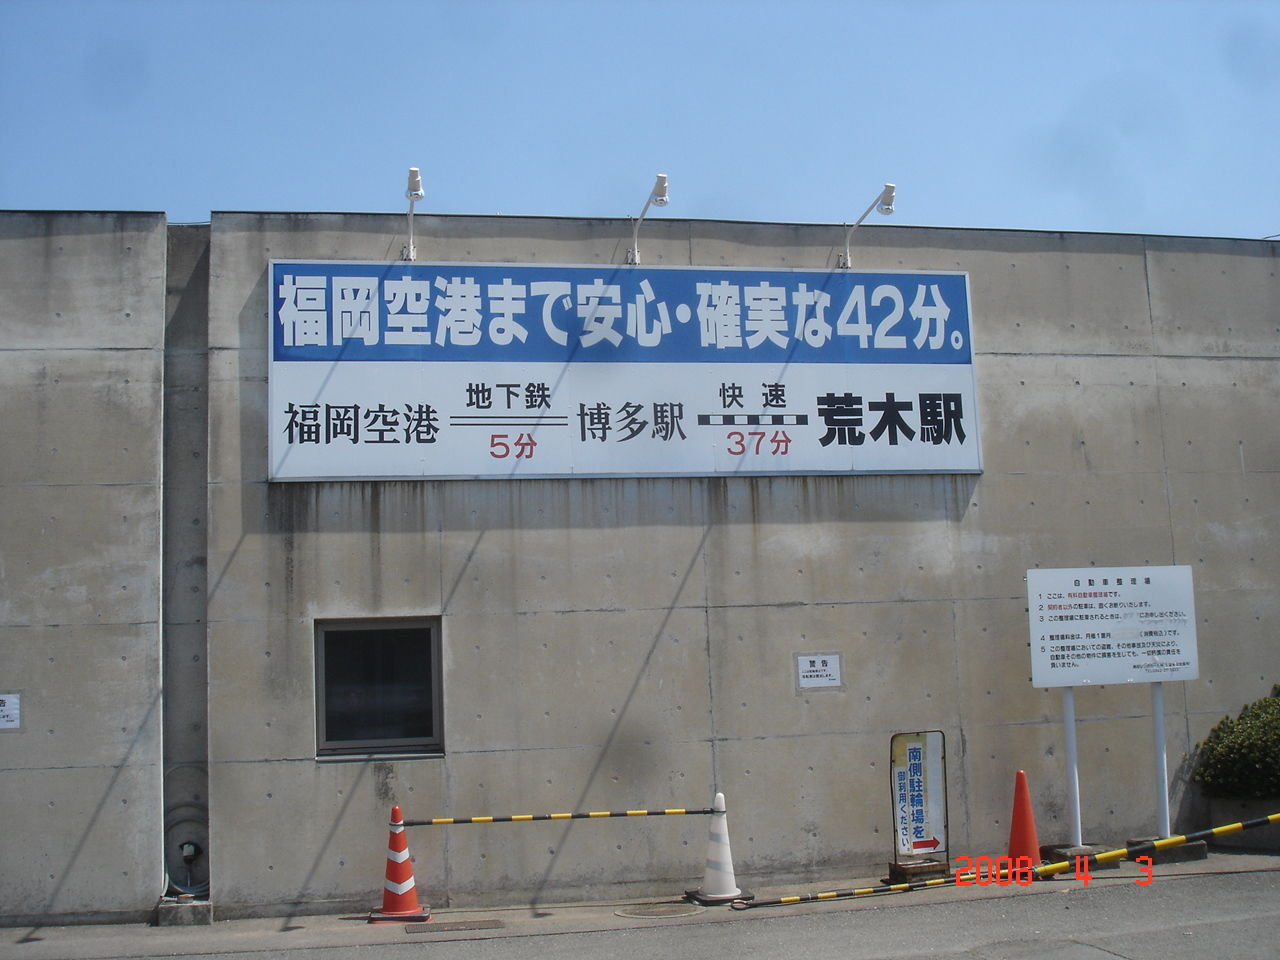 荒木駅 - Araki Station (Fukuoka) - JapaneseClass.jp